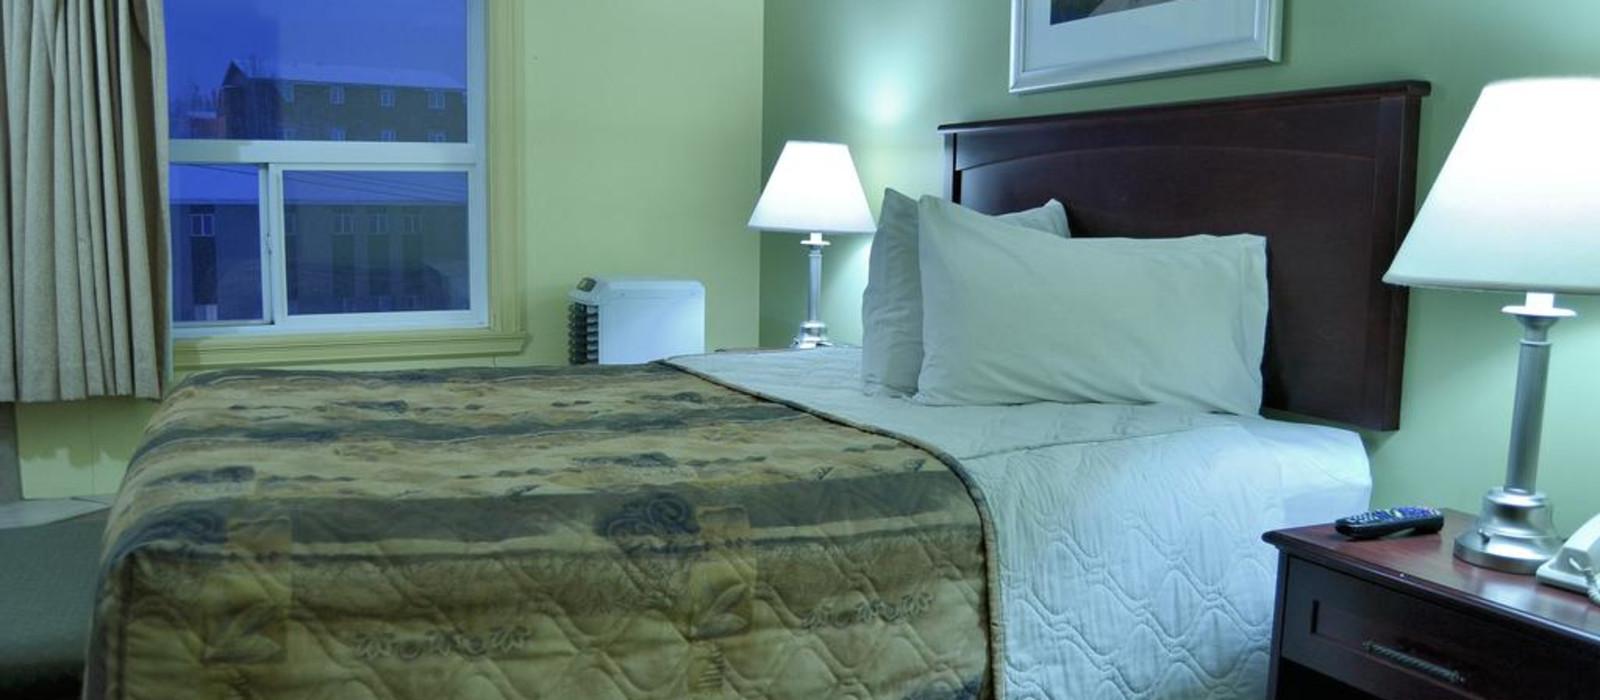 Hotel Nova Inn Kanada